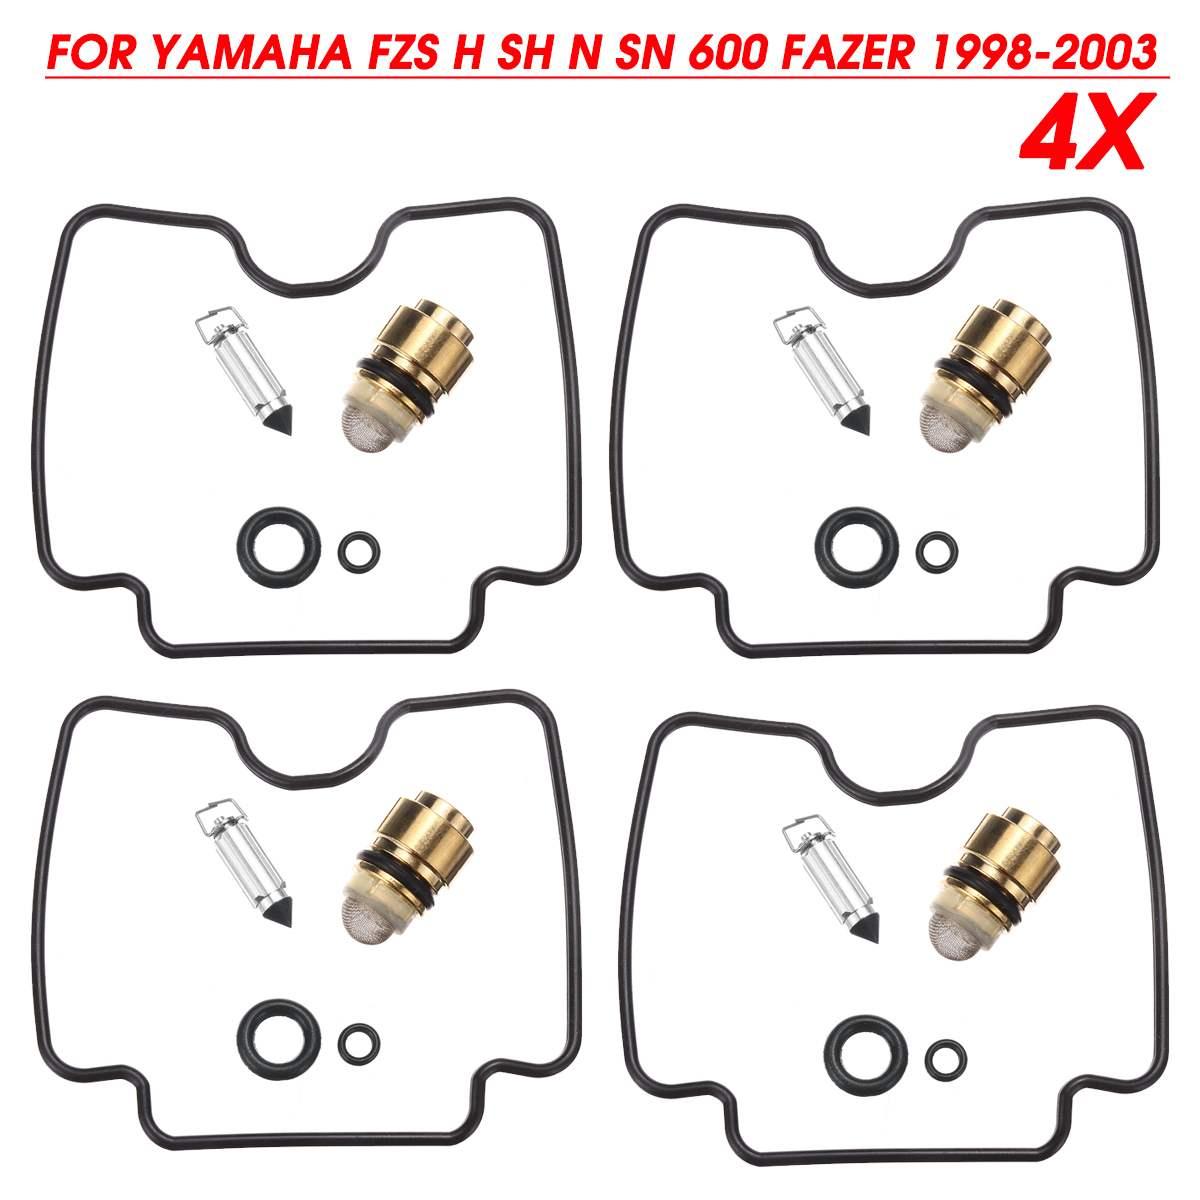 Kit de reparación de carburador de motocicleta Autoleader 4Set herramientas de reconstrucción de chorro de aguja flotante para Yamaha FZS H SH N GN 600 Fazer 1998-2003